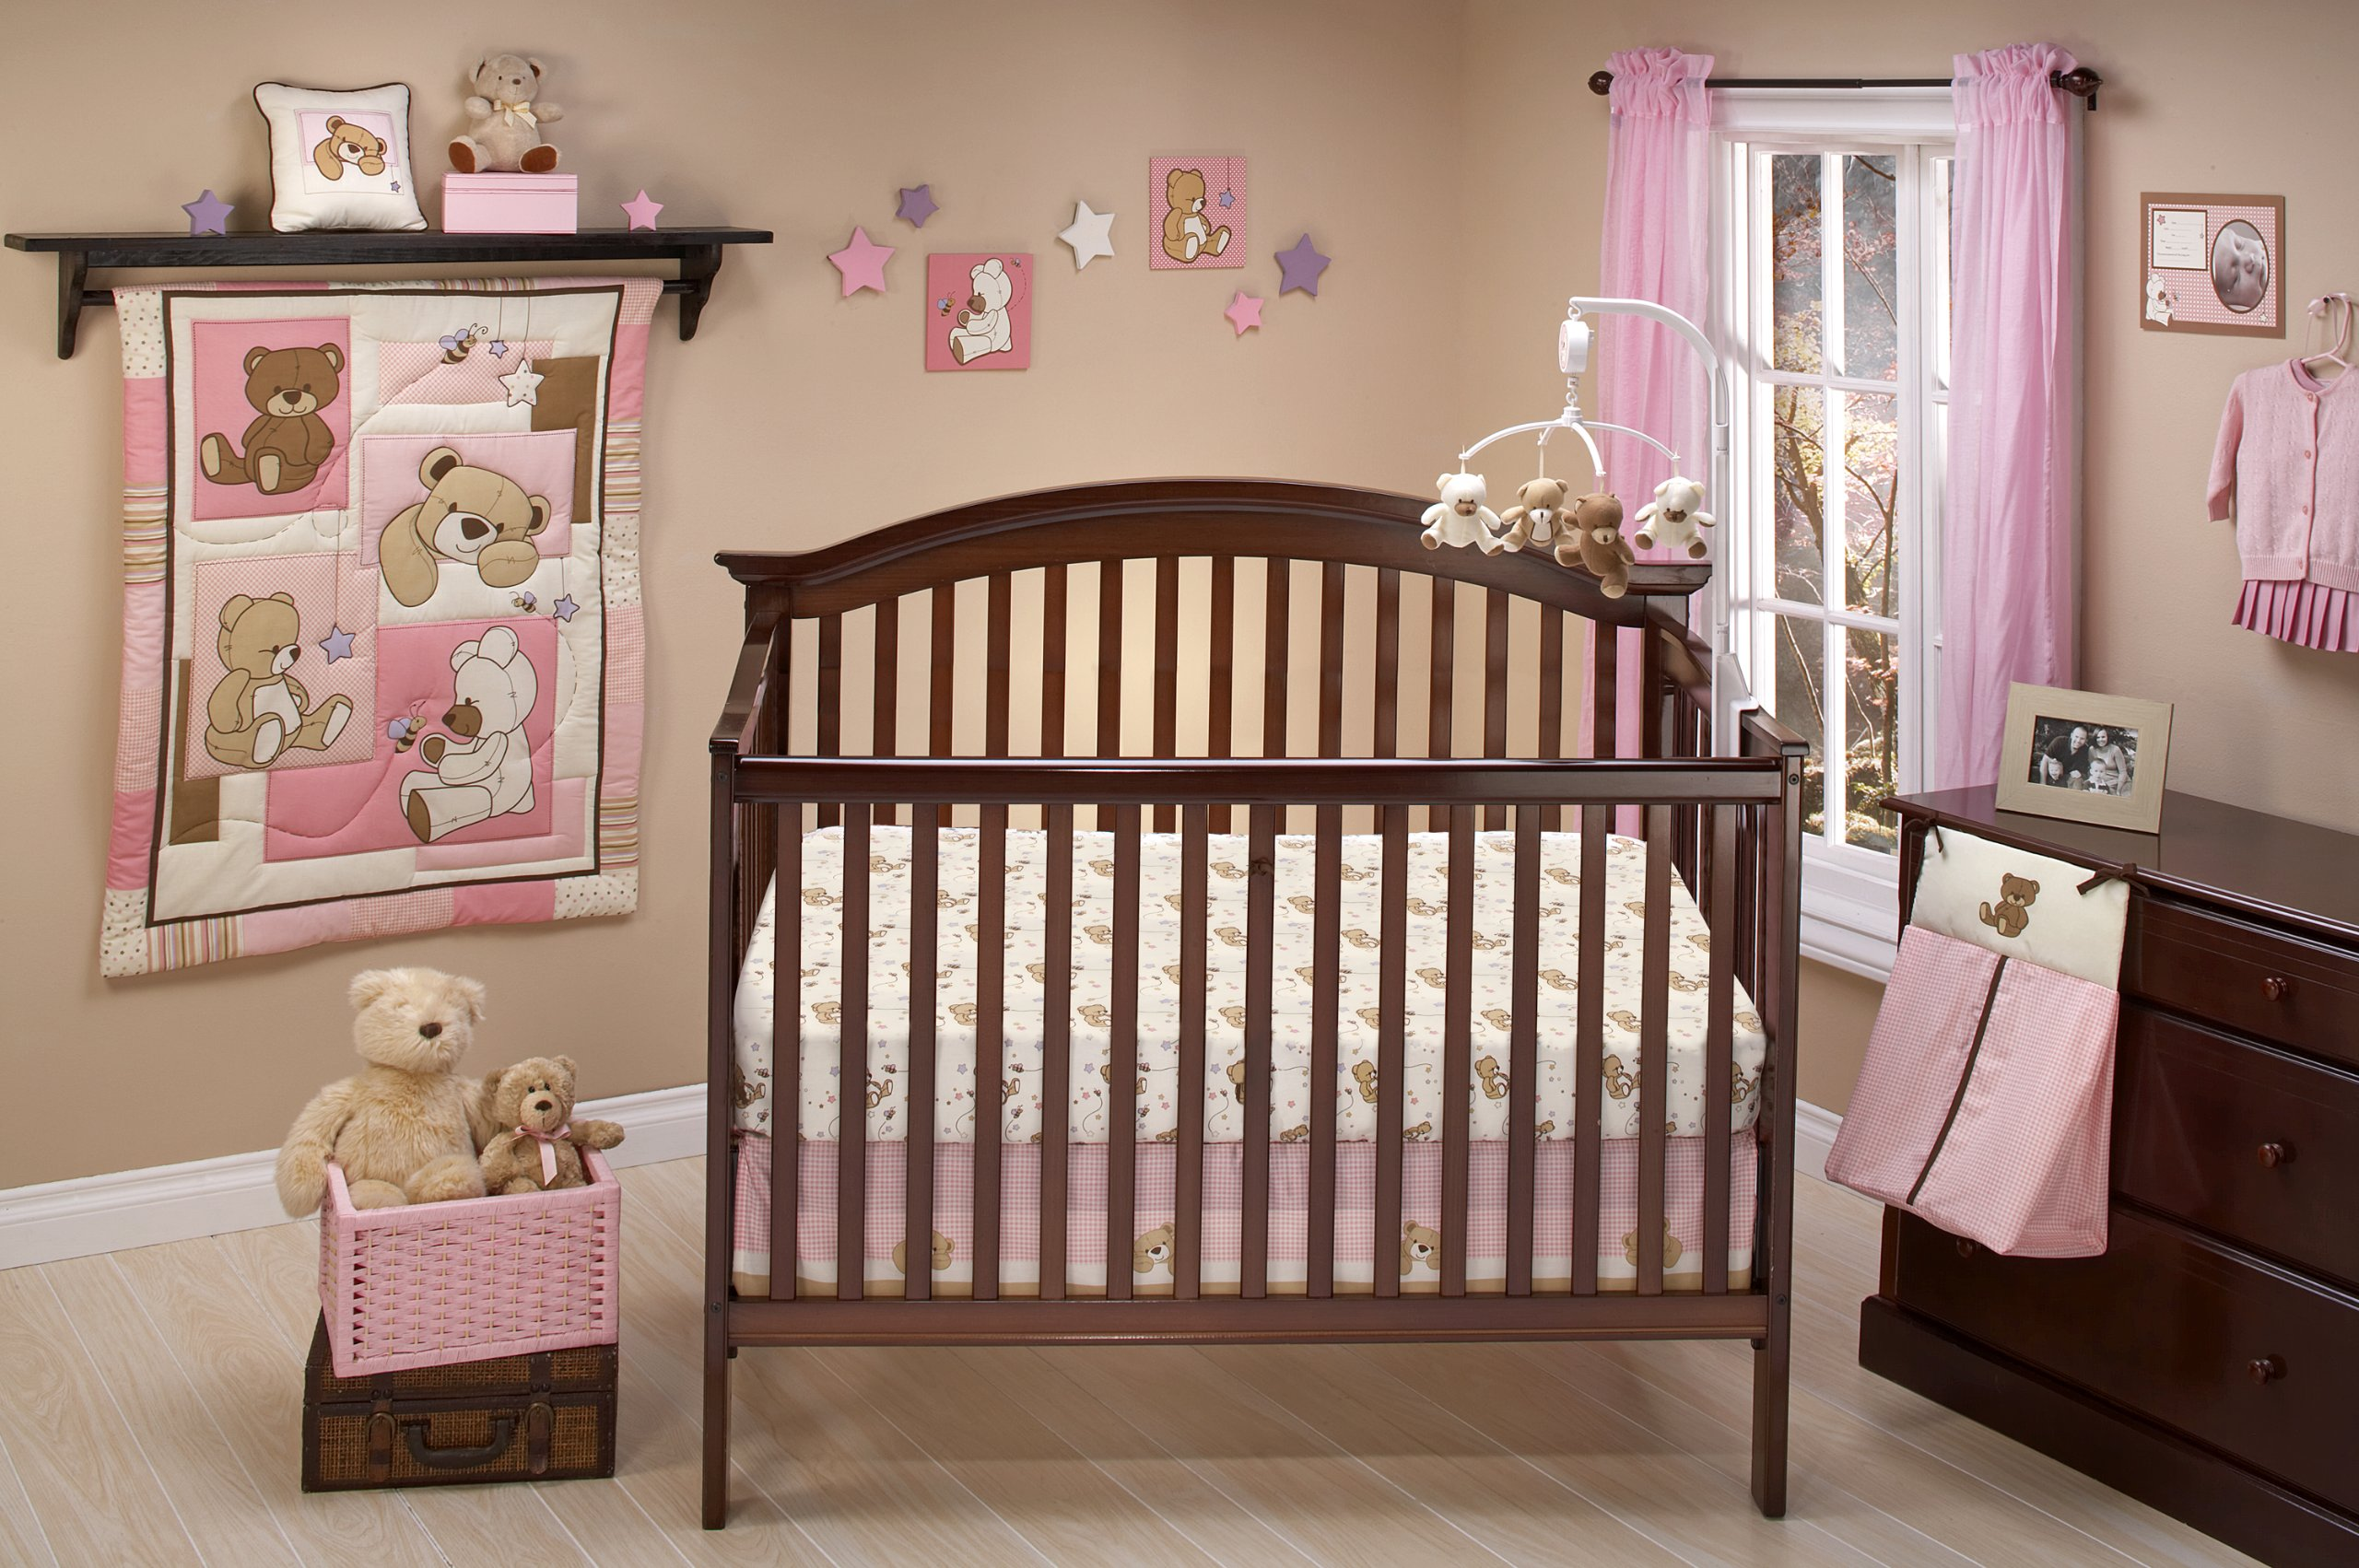 Amazon.com : NoJo Little Bedding Jungle Pals Window Valance : Baby Nursery Window Treatments : Baby